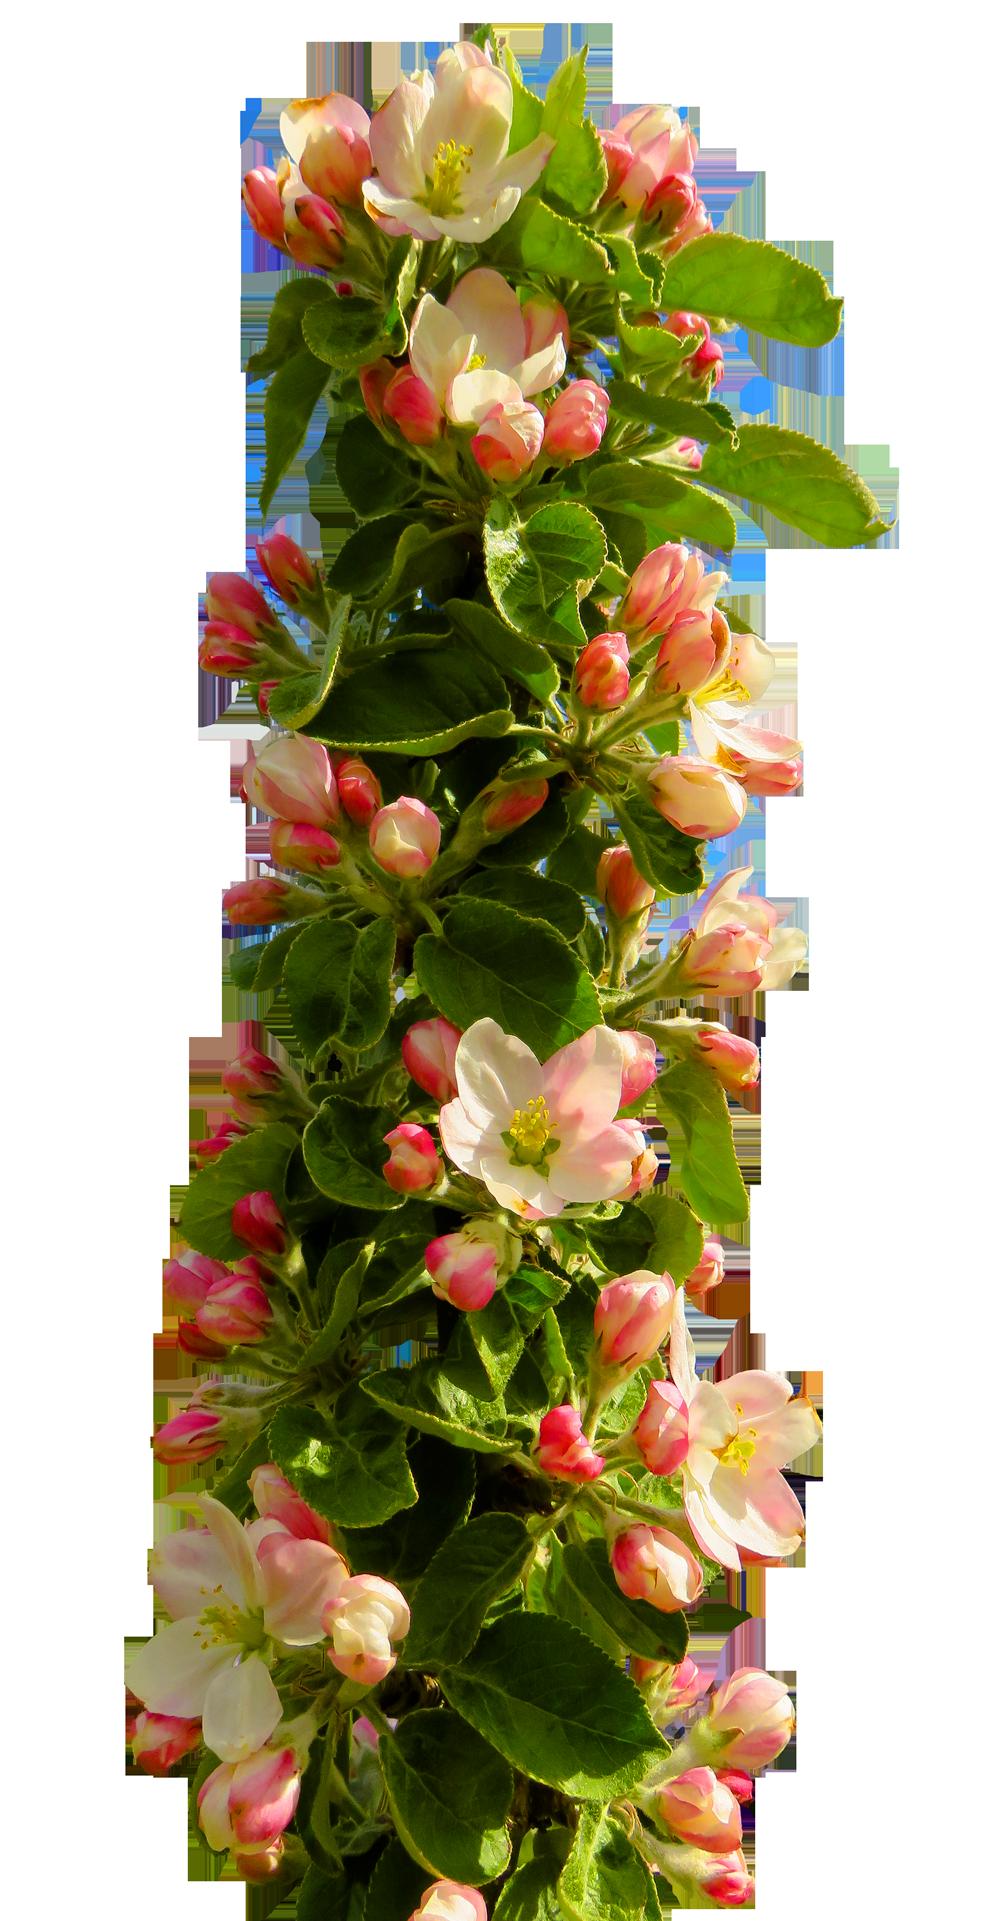 Spring Flower PNG Transparent Image - PNG Gamla